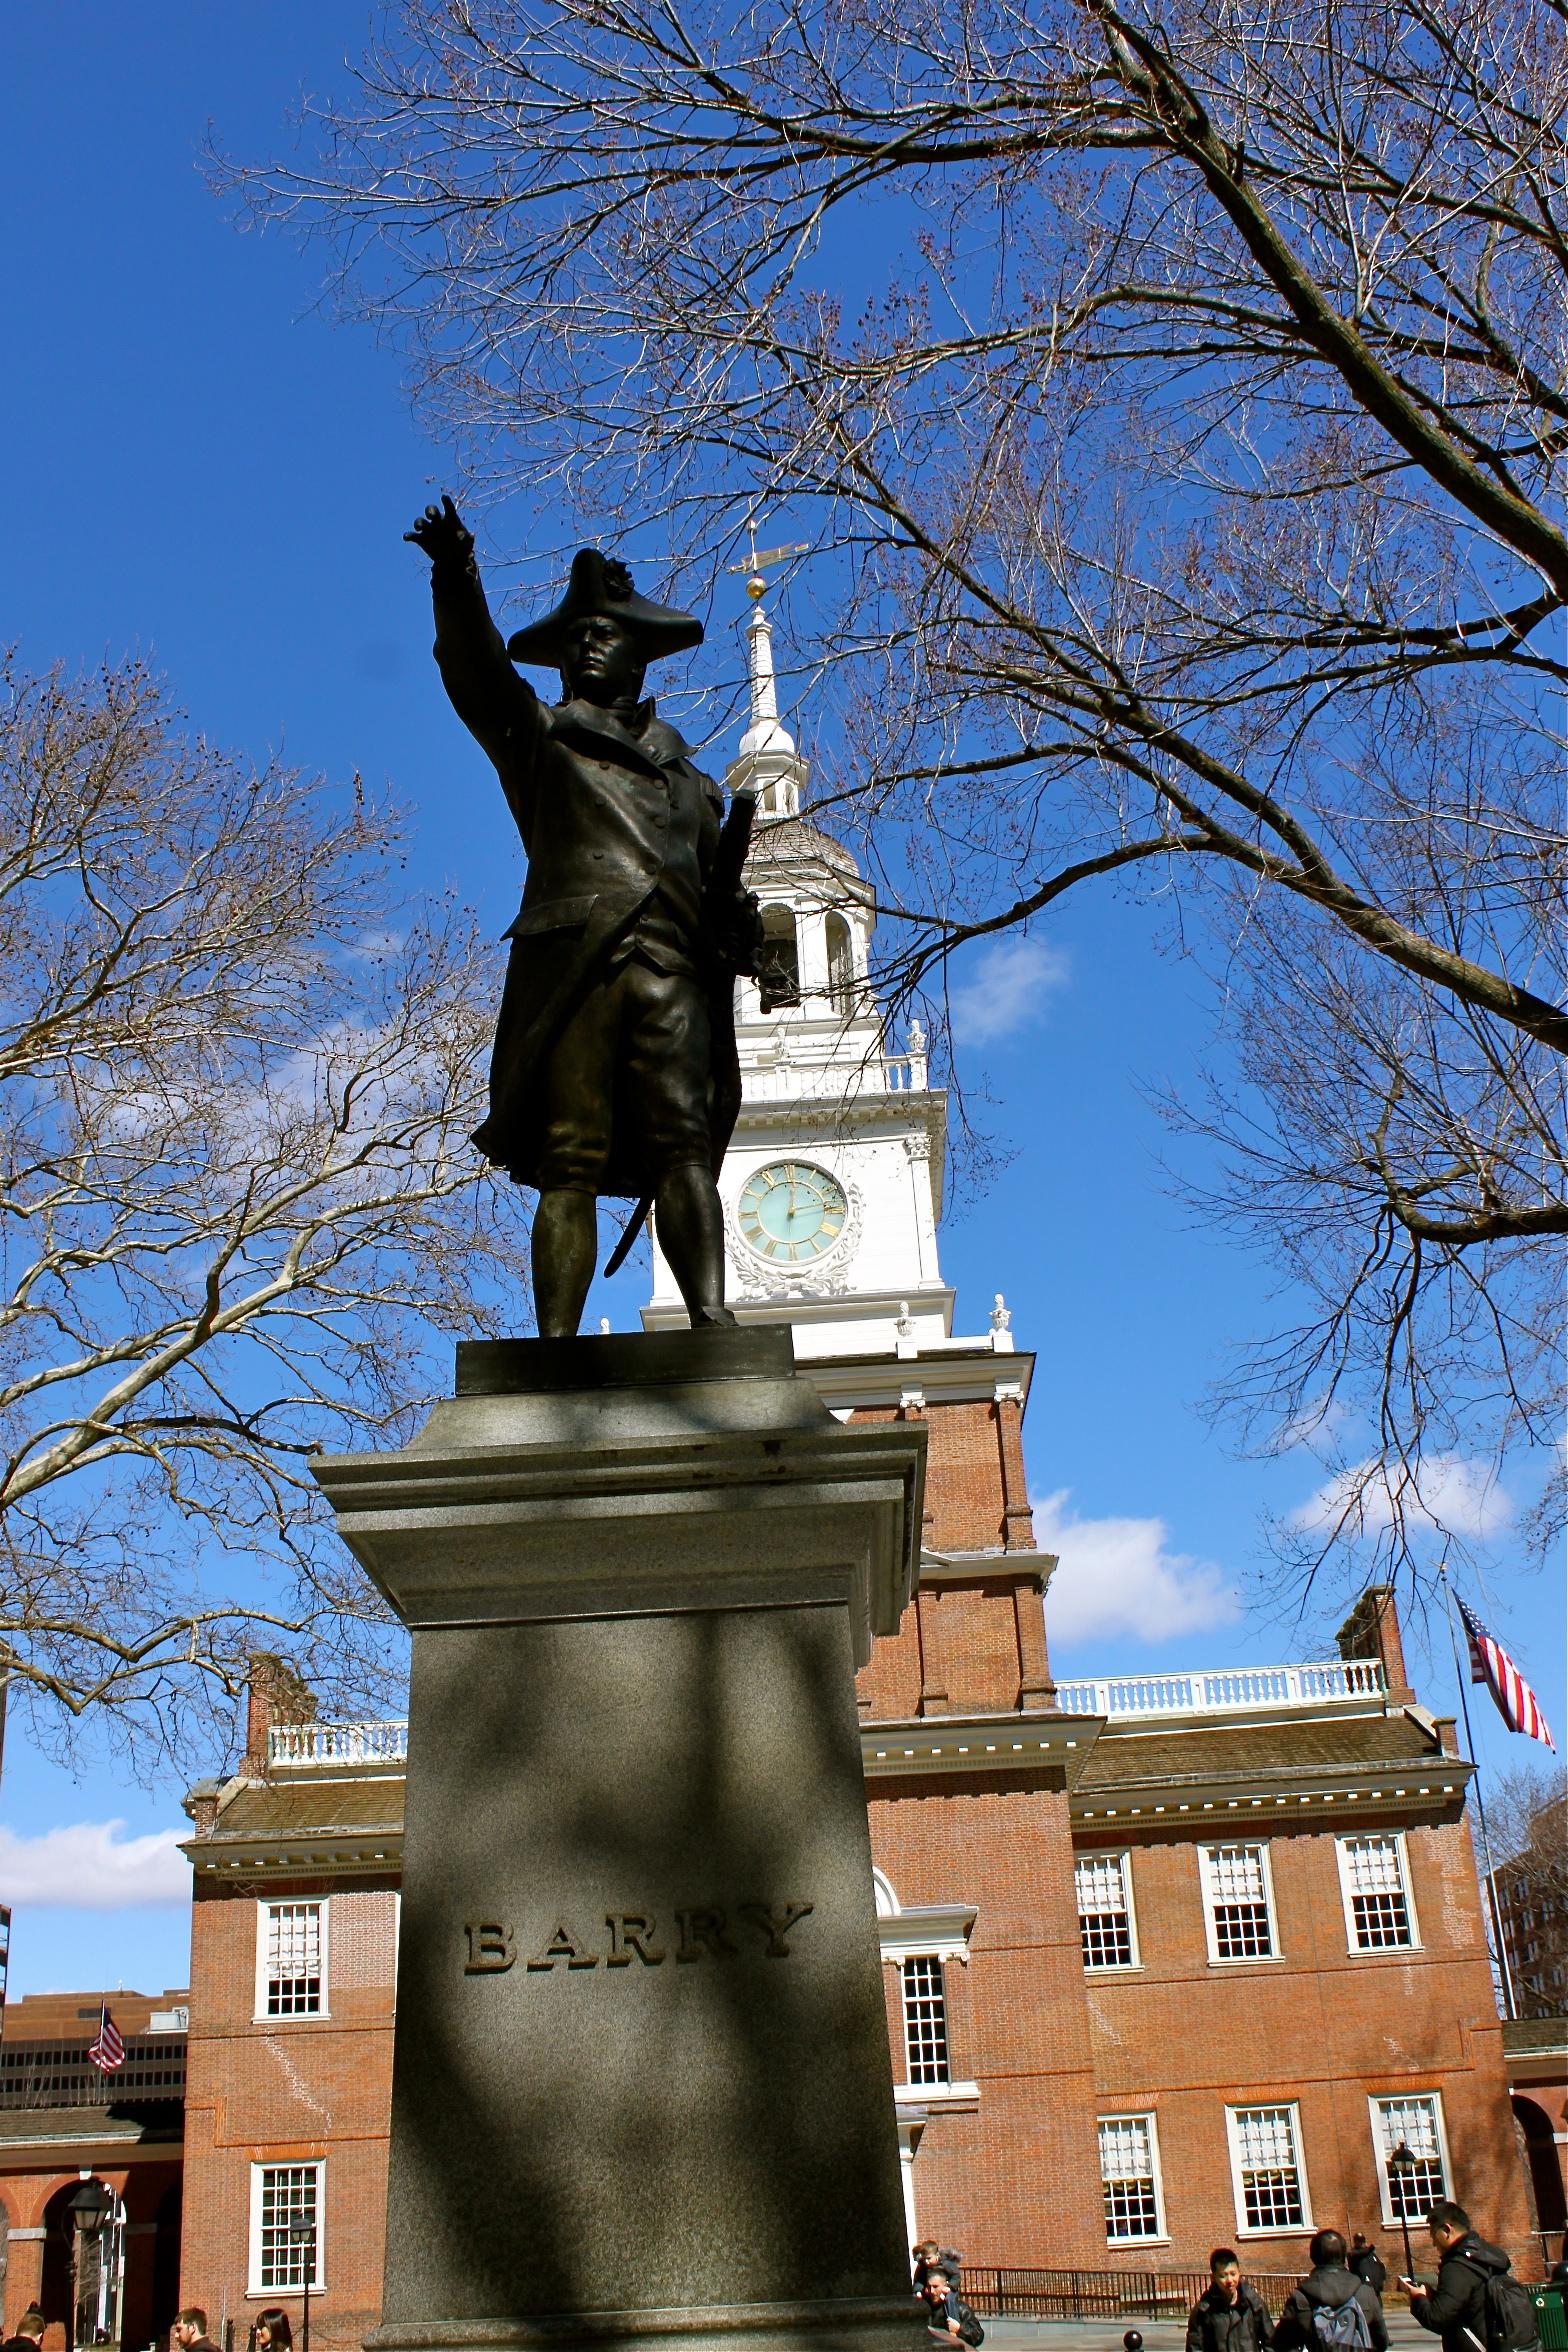 barry statue independence hall philadelphia